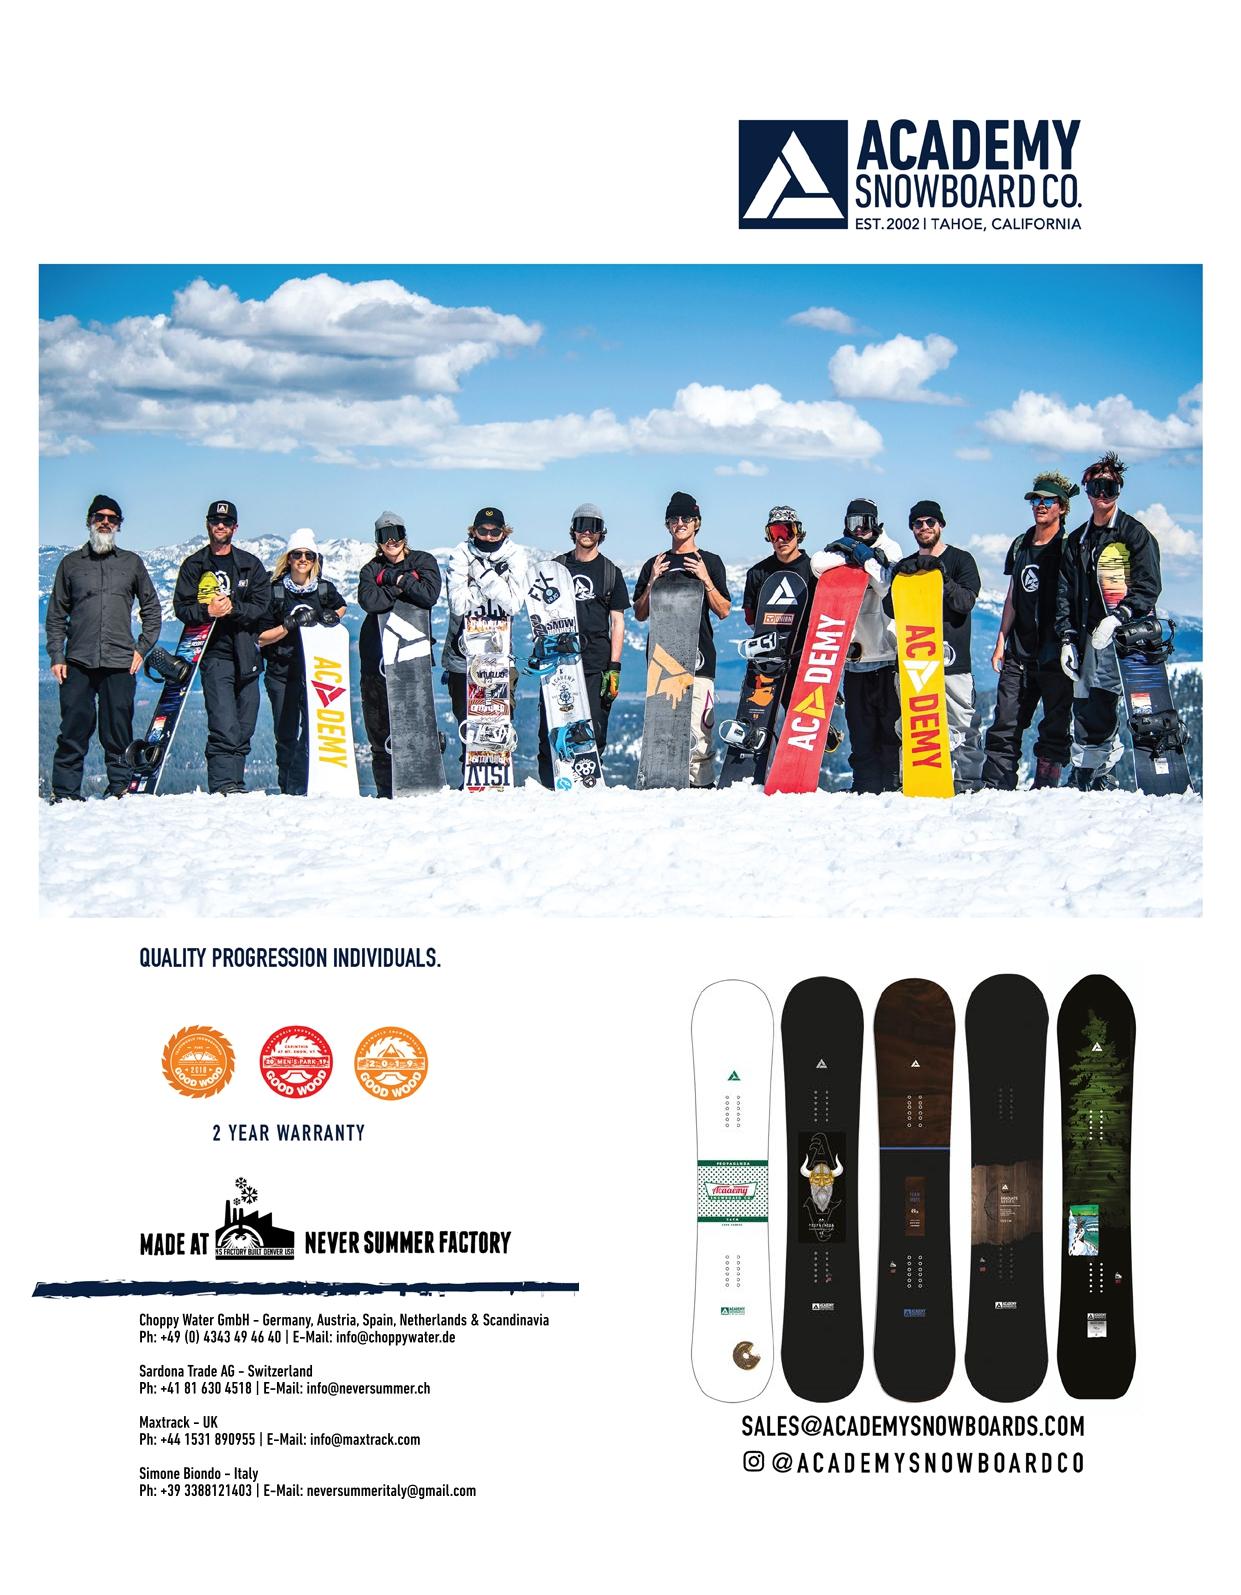 105 Academy snowboards